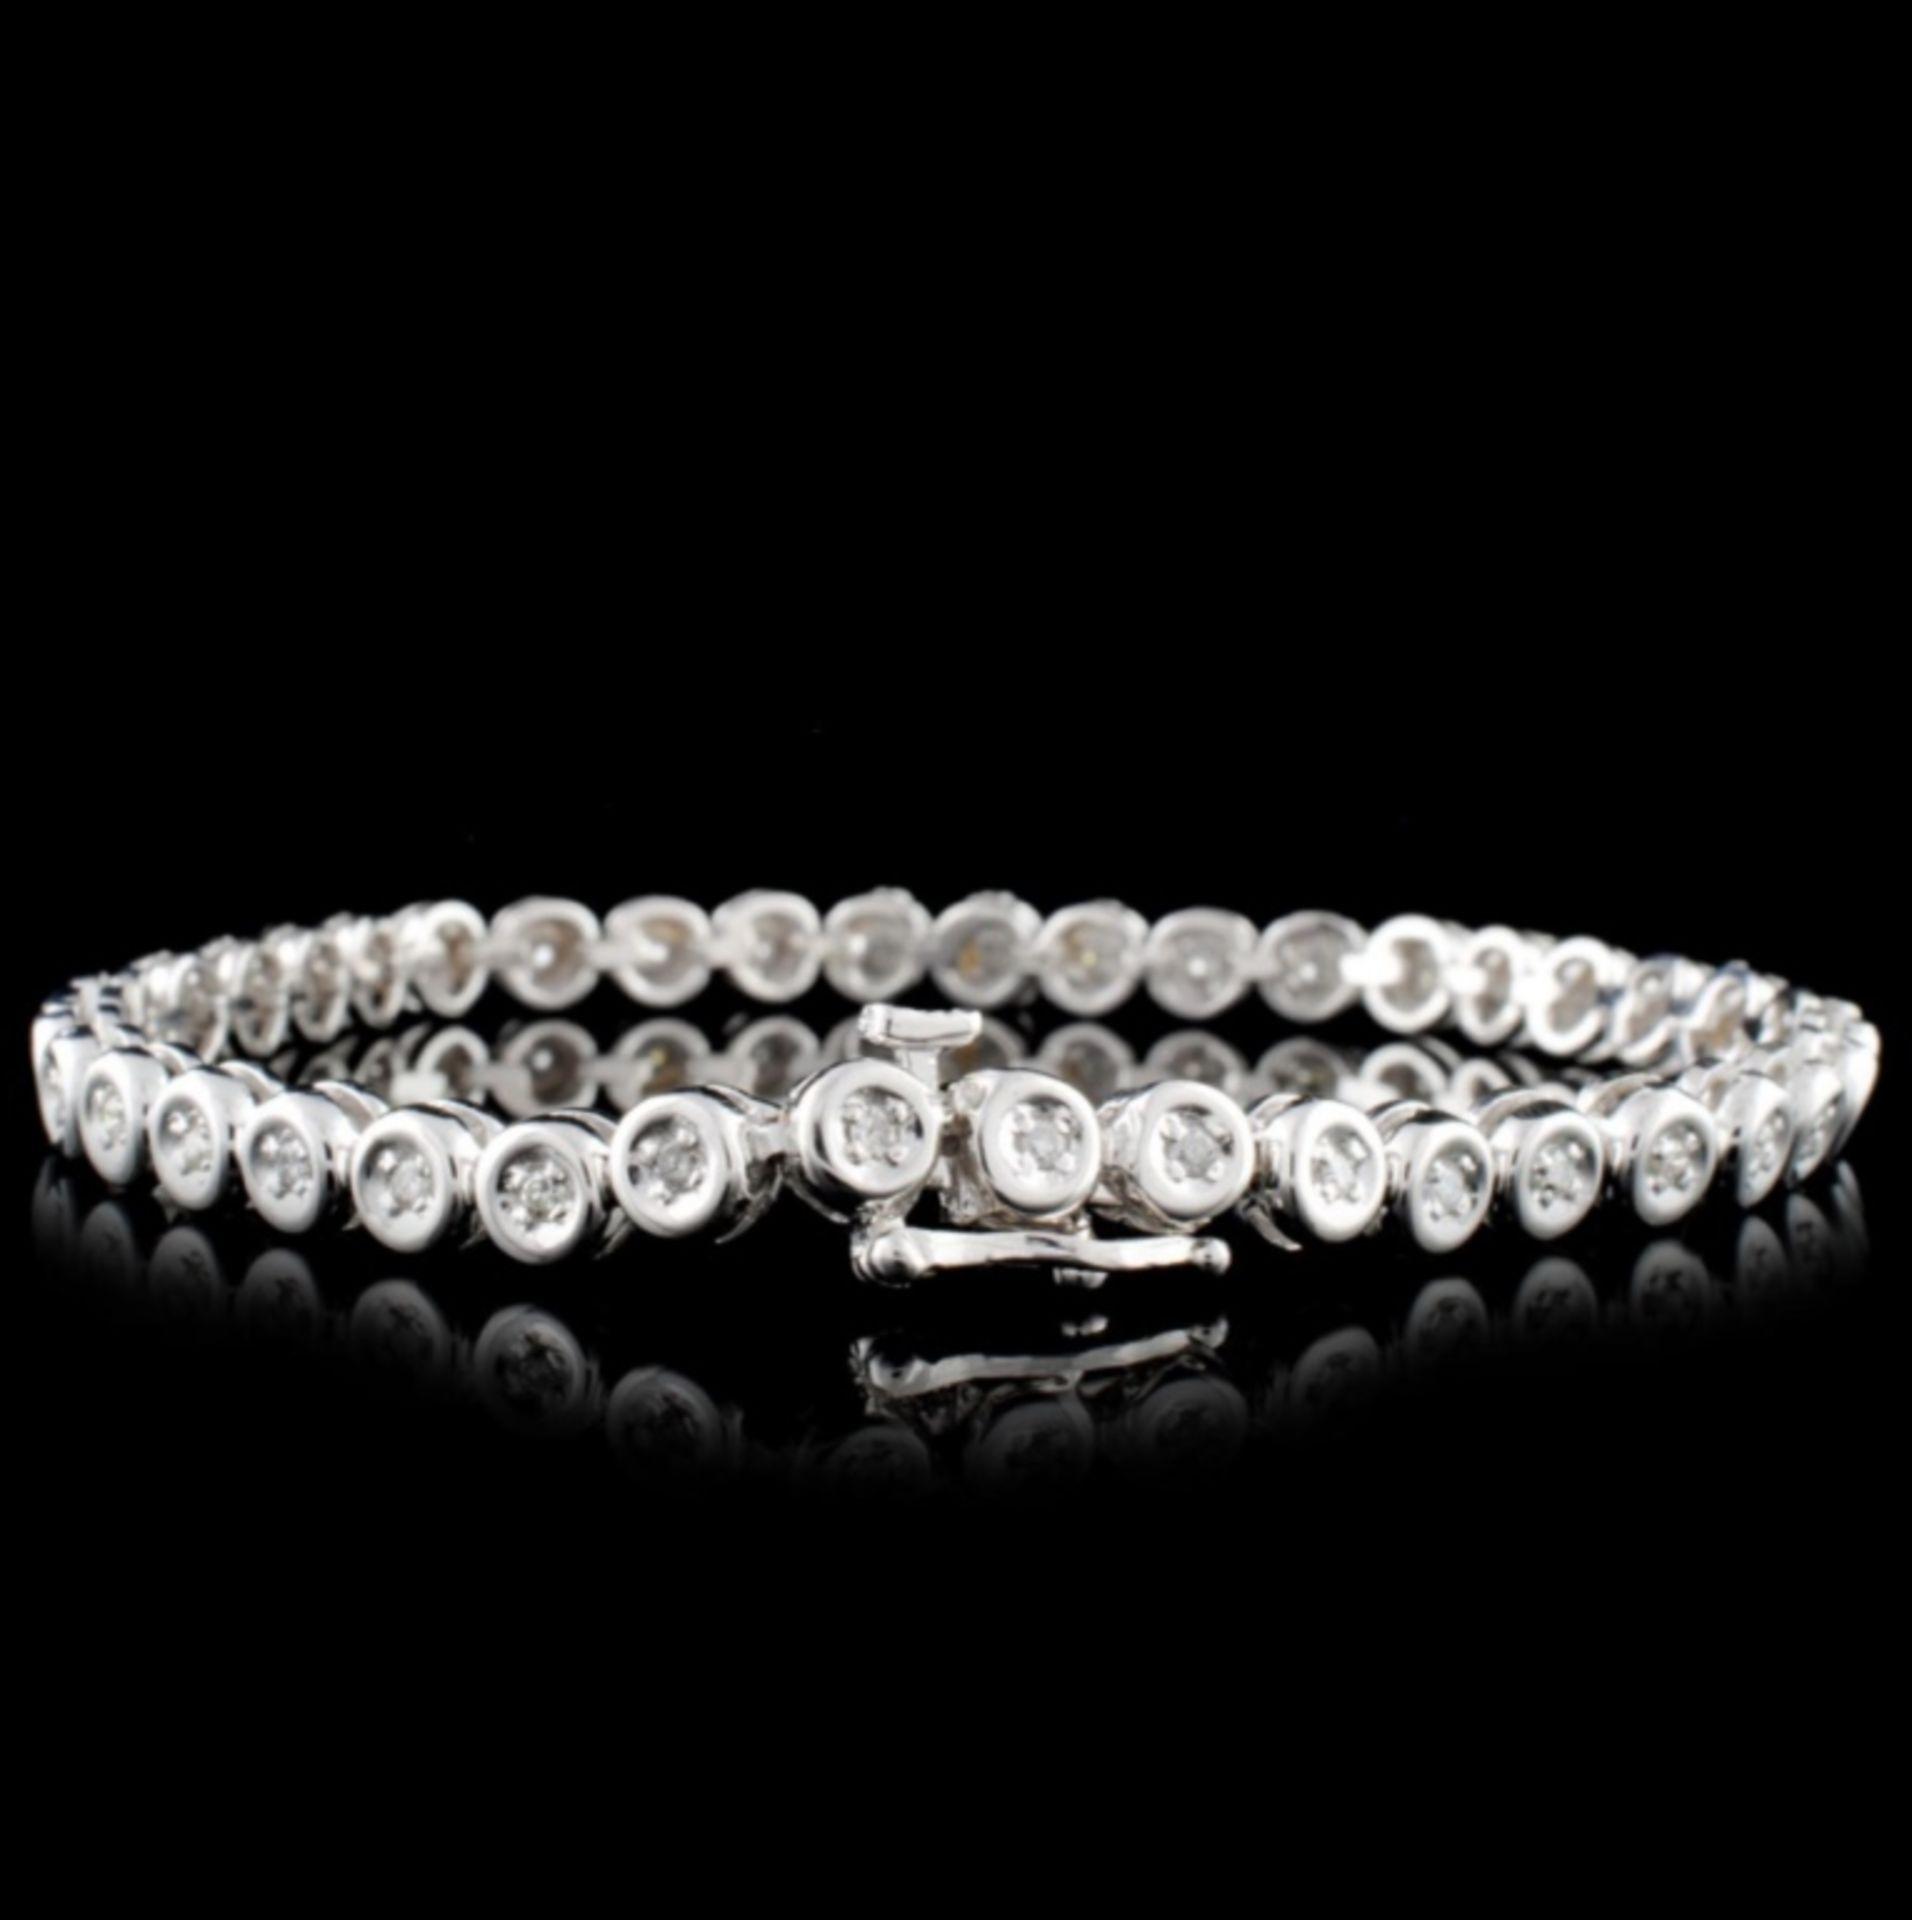 14K White Gold 0.50ctw Diamond Bracelet - Image 2 of 3